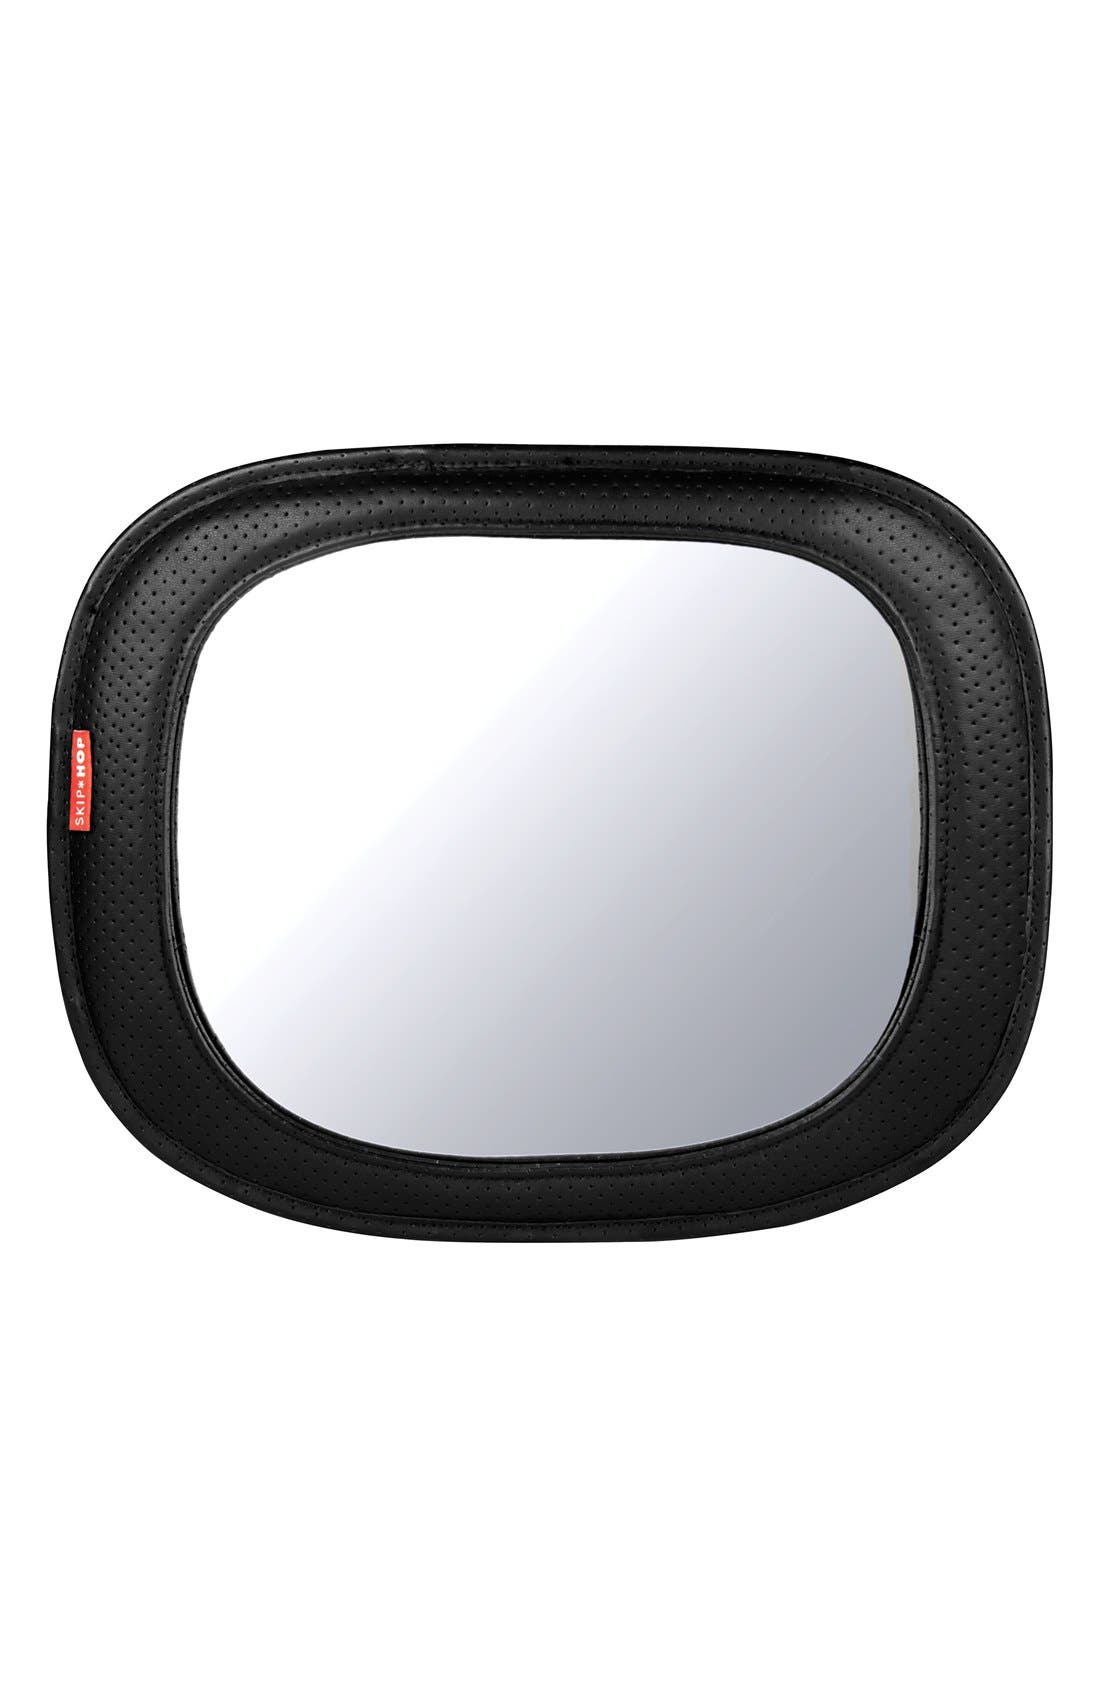 Alternate Image 1 Selected - Skip Hop Backseat Mirror